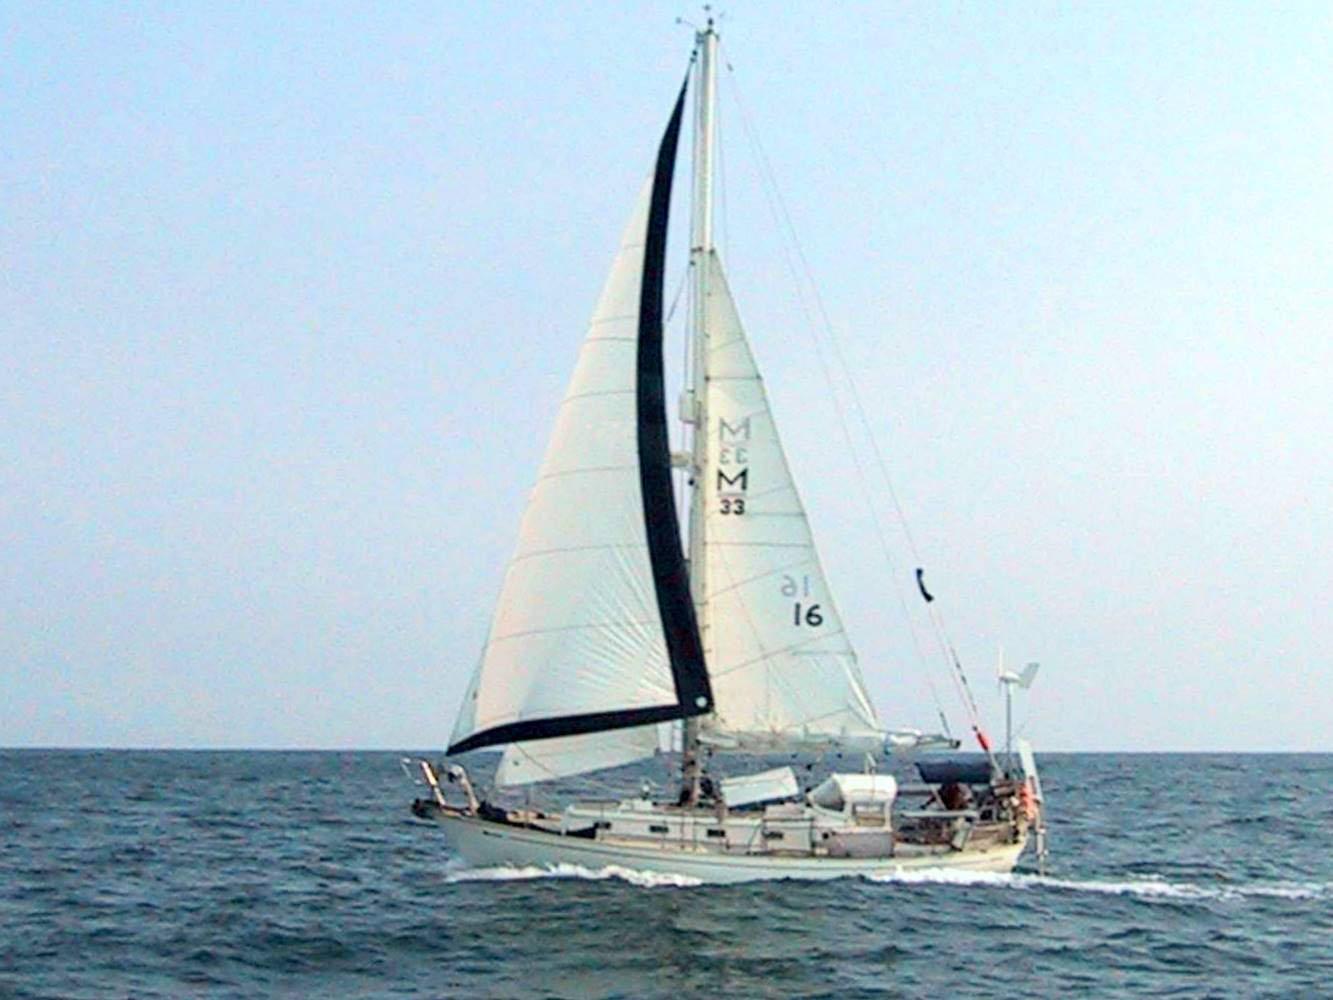 Practical Sailor Review of Mason 33